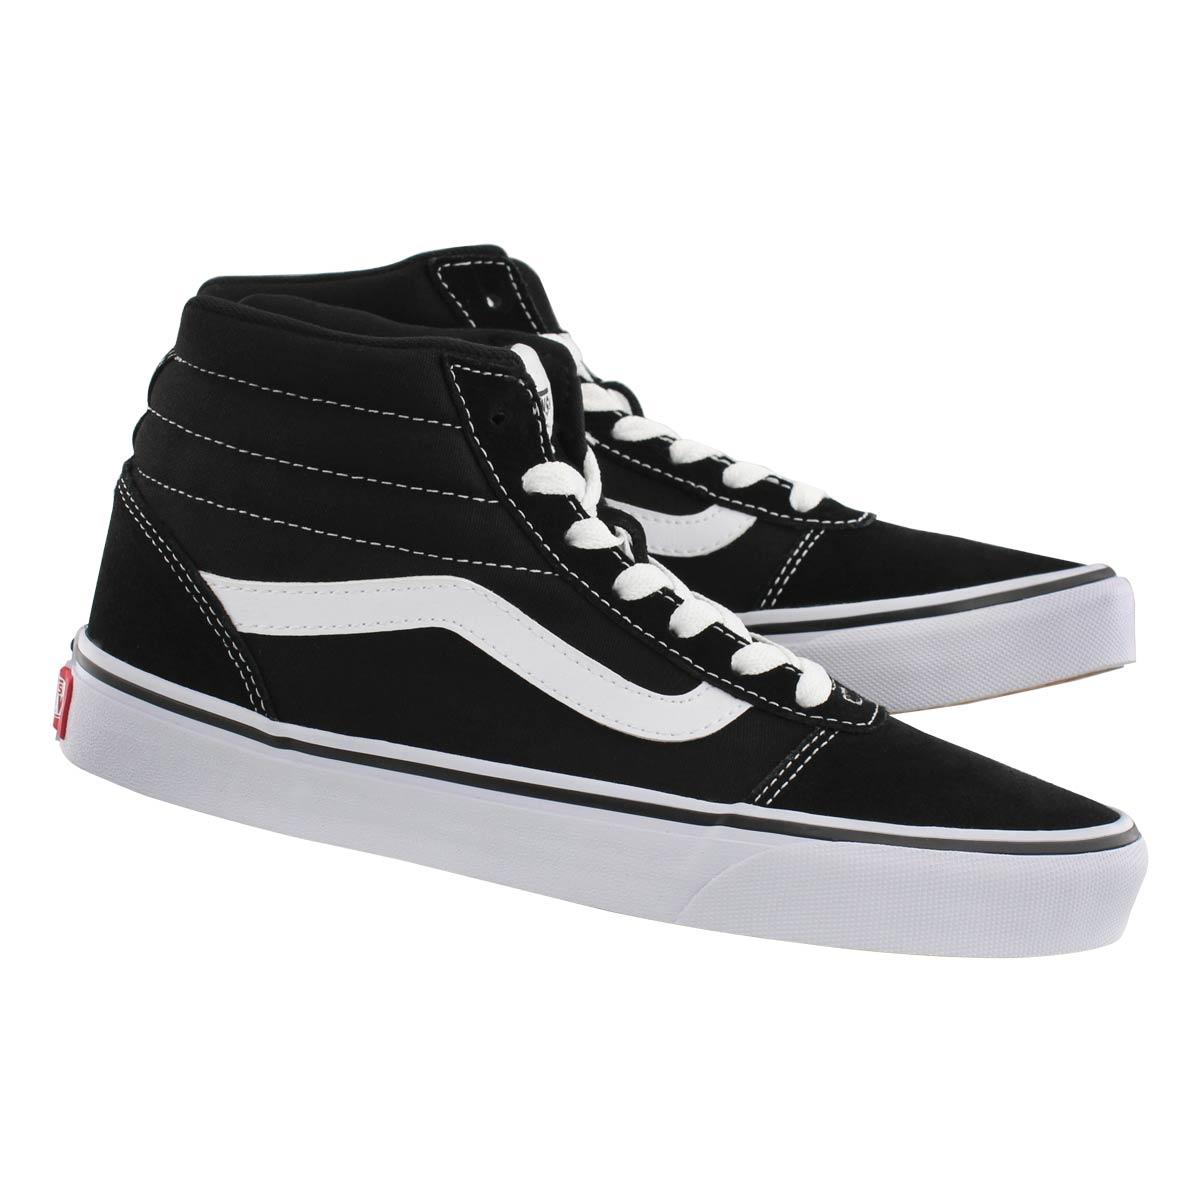 Lds Ward Hi blk/wht laceup sneaker